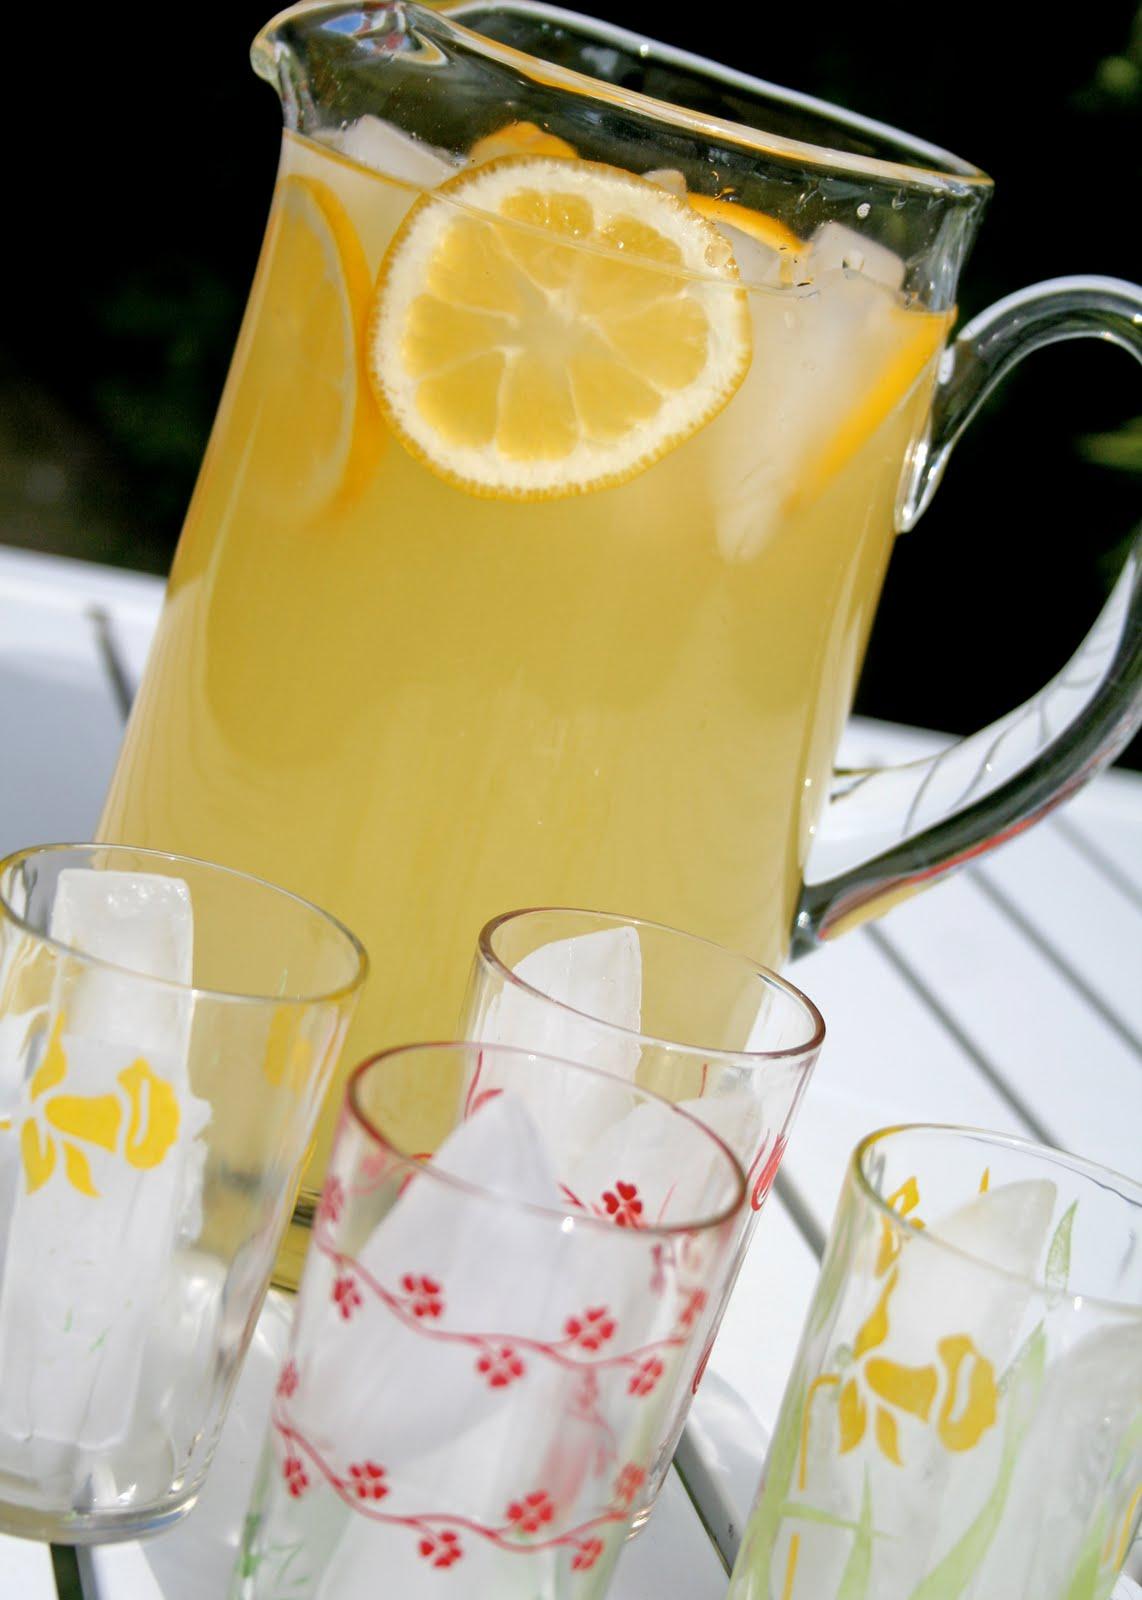 lemonade pitcher - photo #22